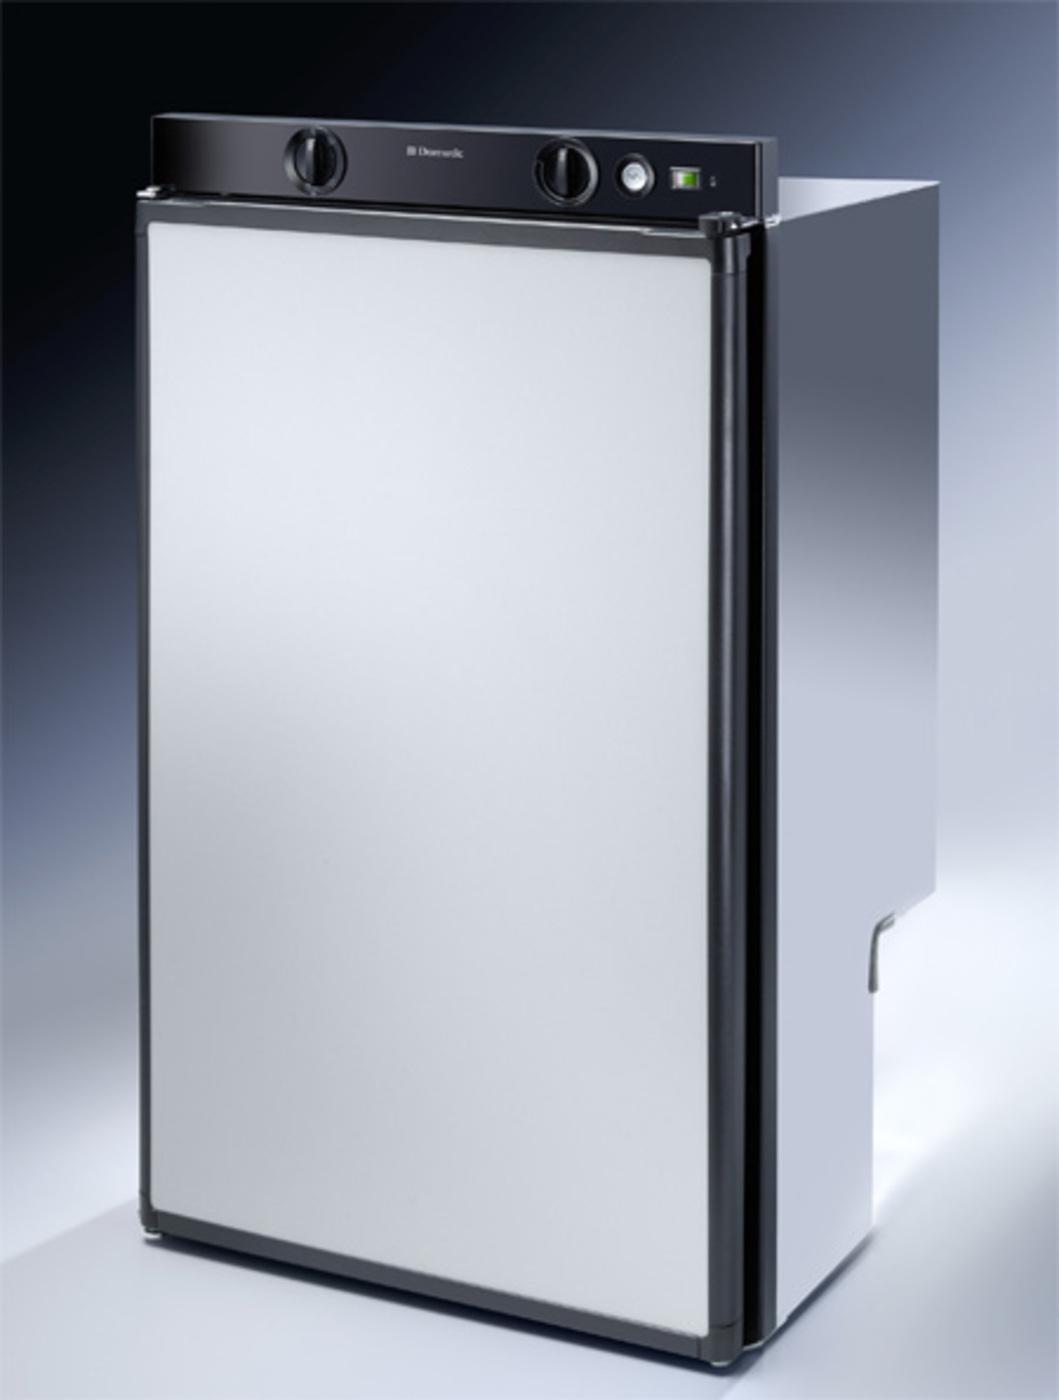 Dometic rm 5330 fridge for caravan motorhome homestead Fridge motors for sale